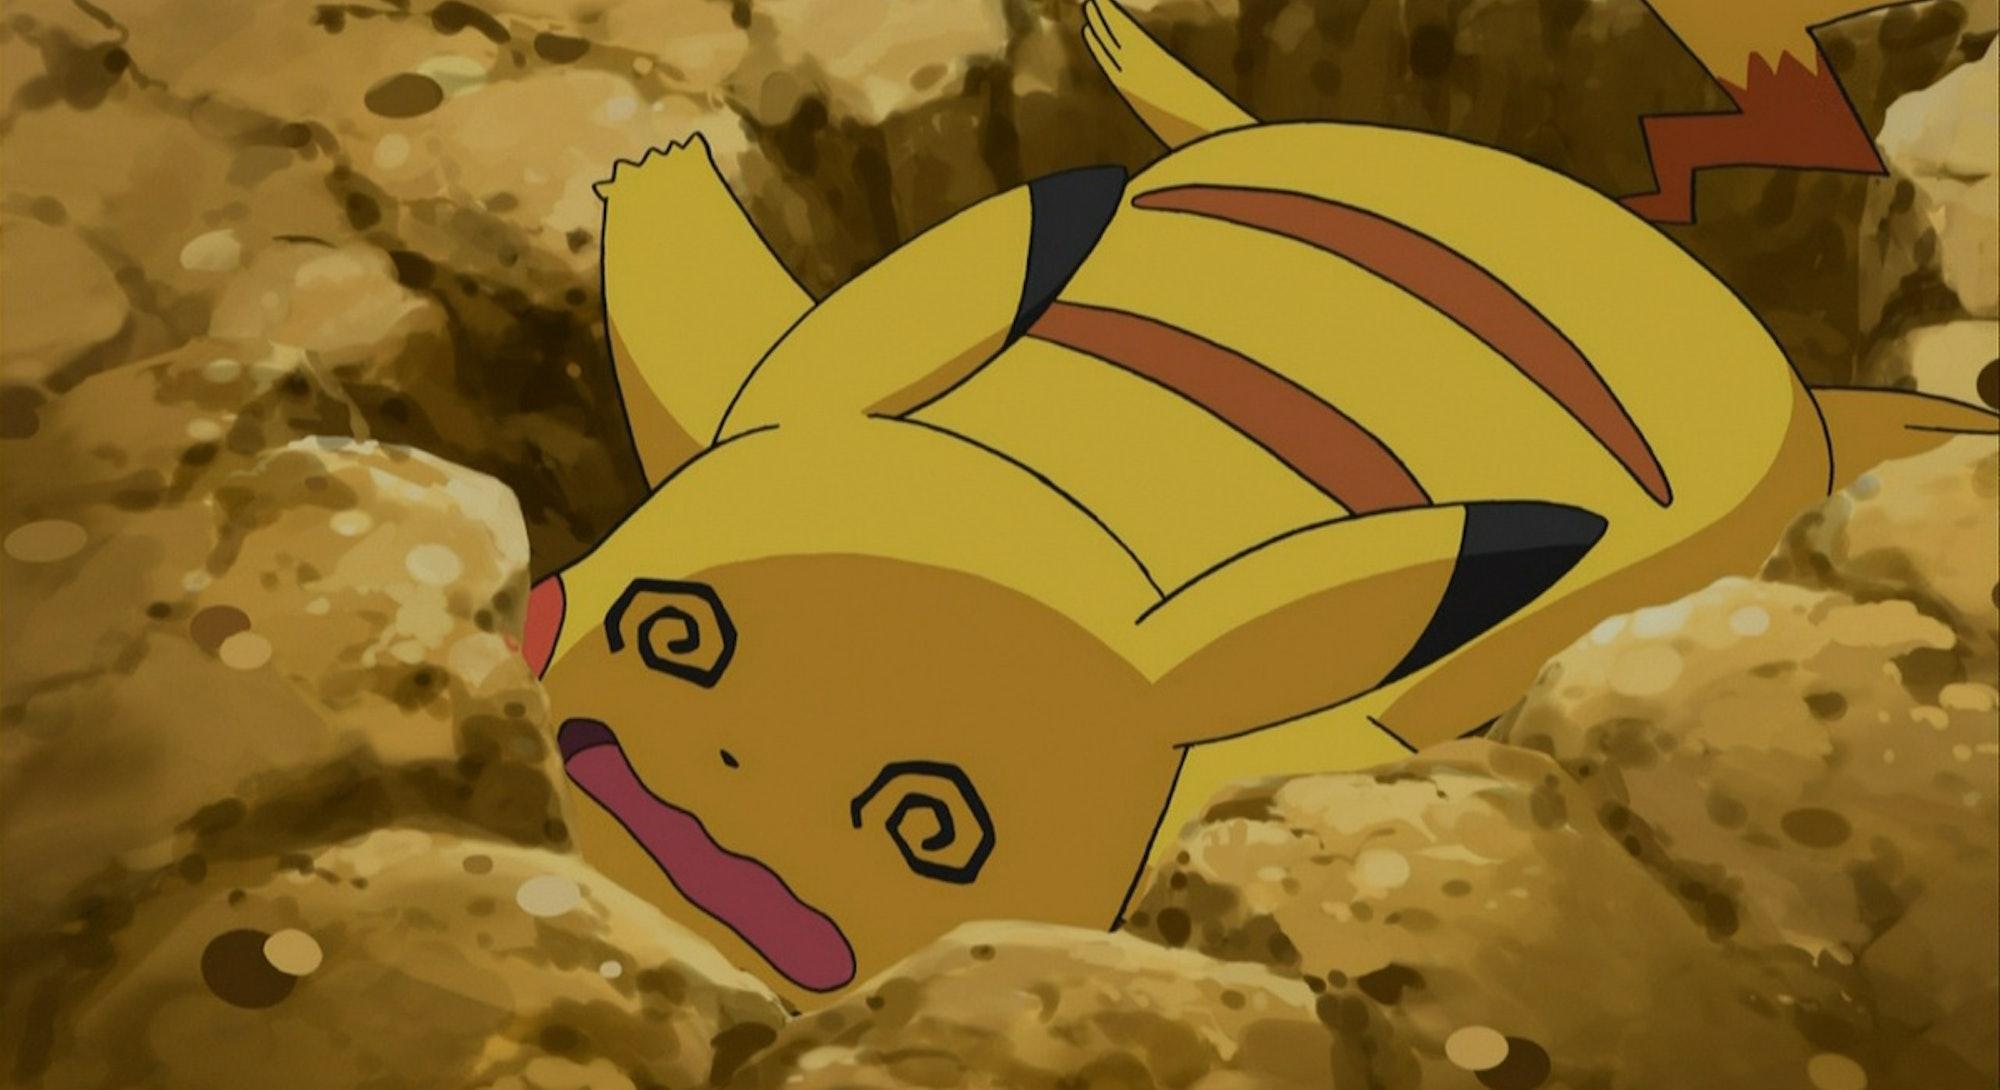 Pikachu from Pokemon.